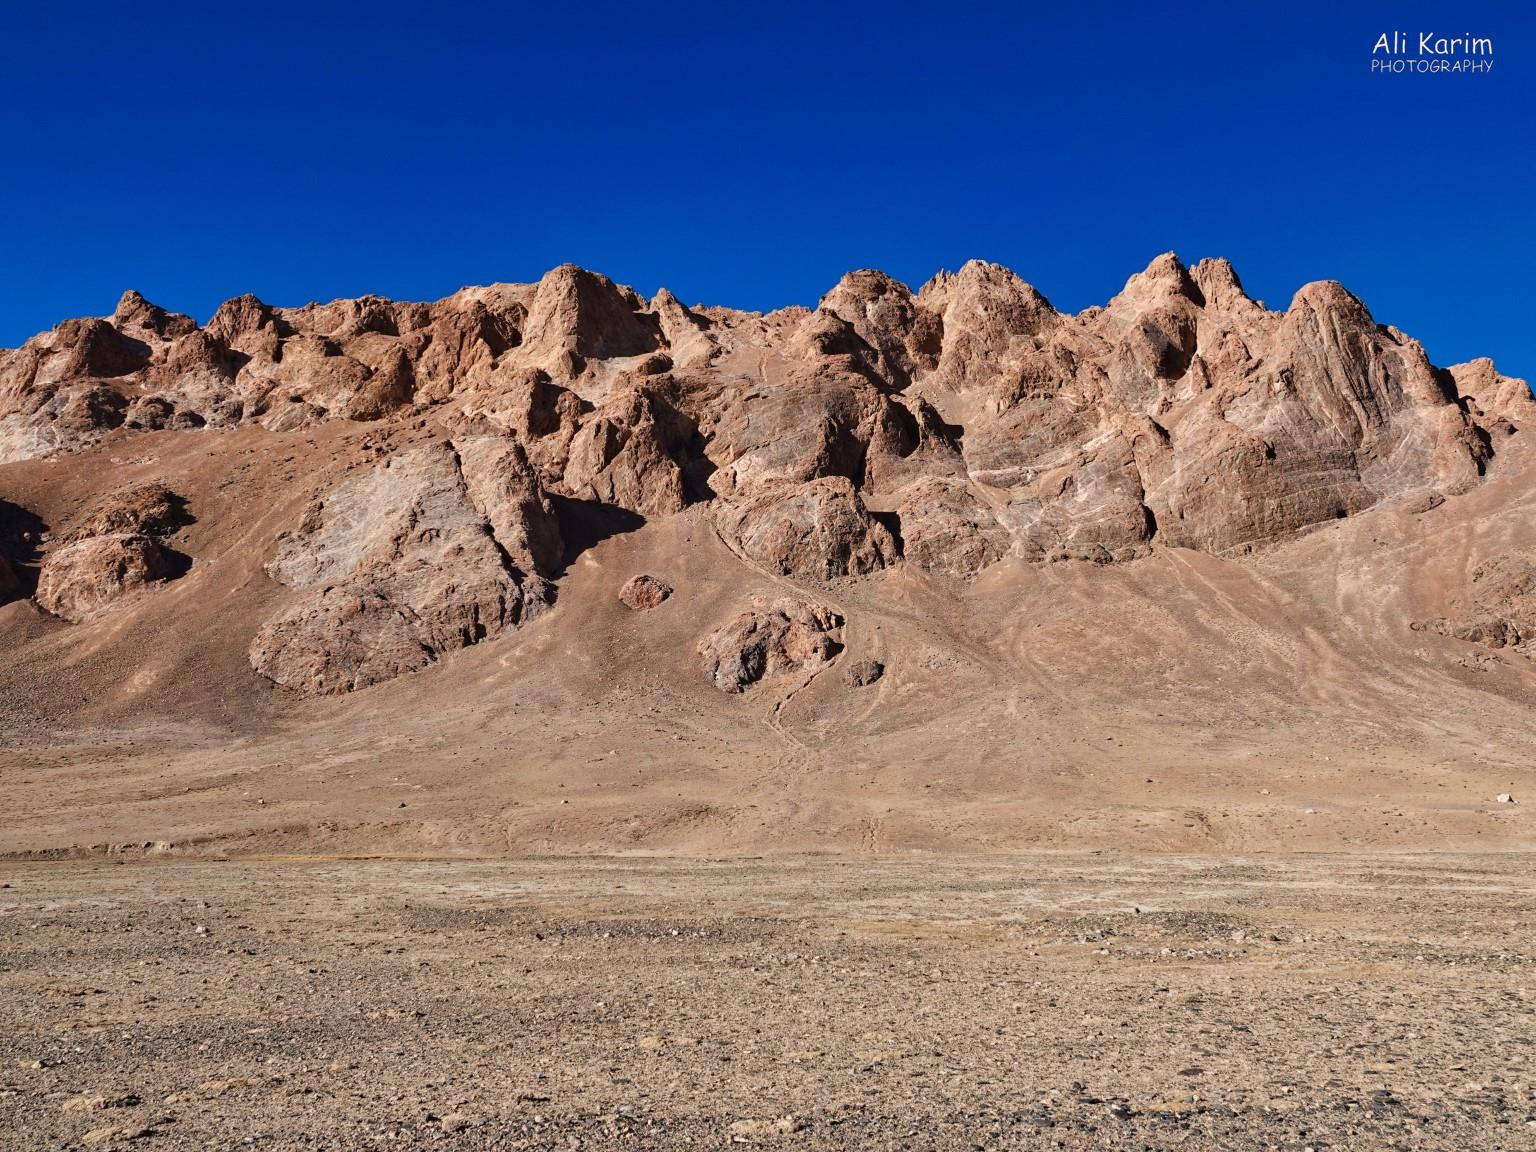 More Murghab & Alichur, Tajikistan, High altitude, but no snow in this desert